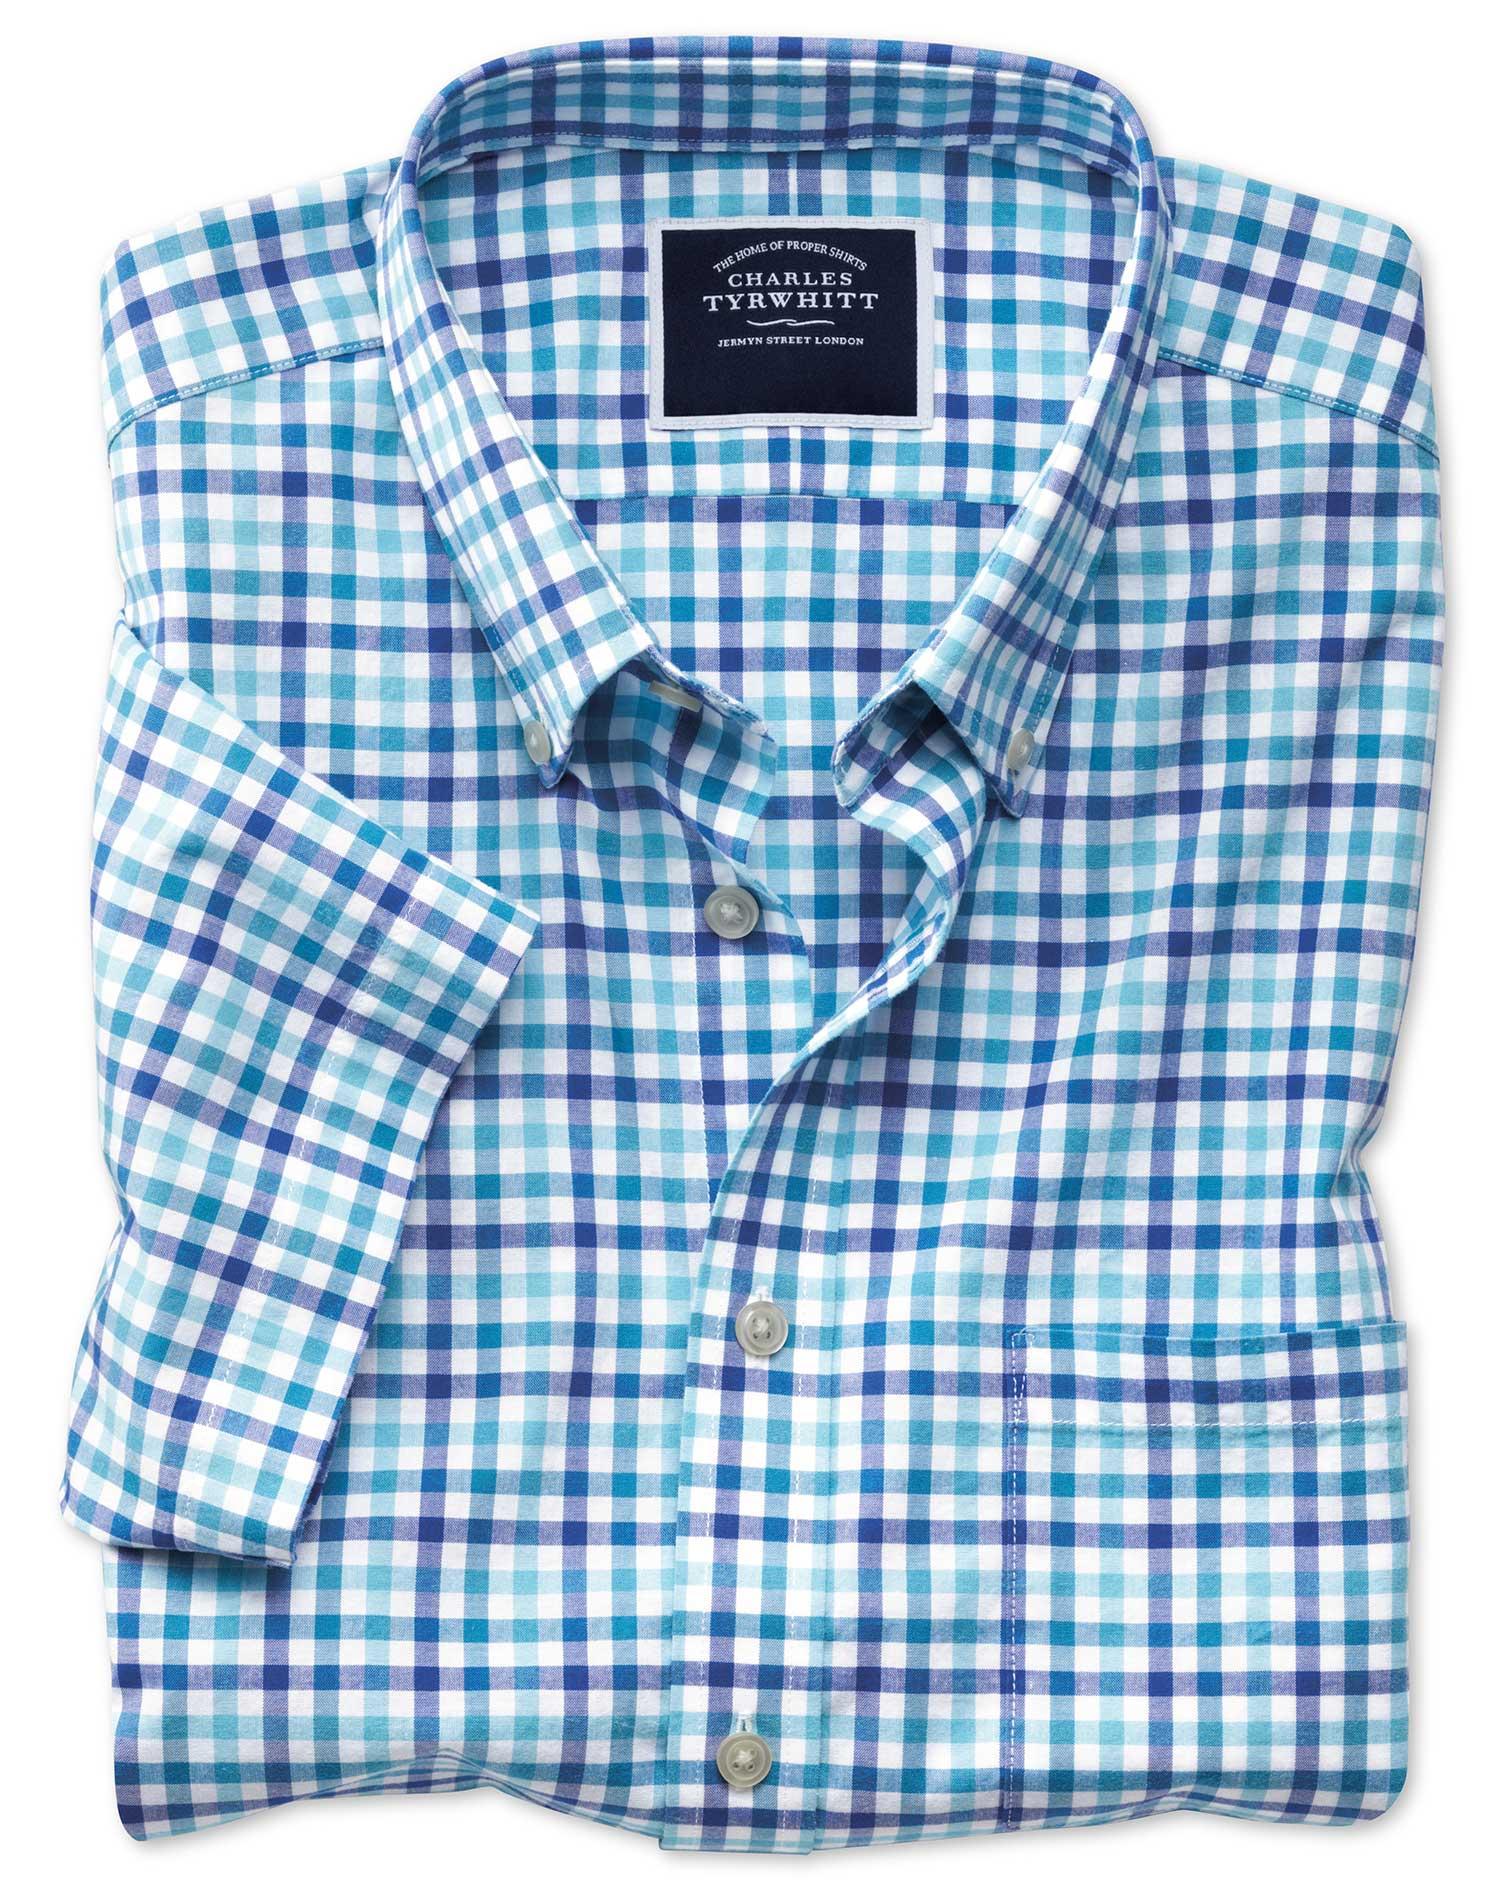 Slim Fit Poplin Short Sleeve Blue Multi Gingham Cotton Shirt Single Cuff Size XS by Charles Tyrwhitt